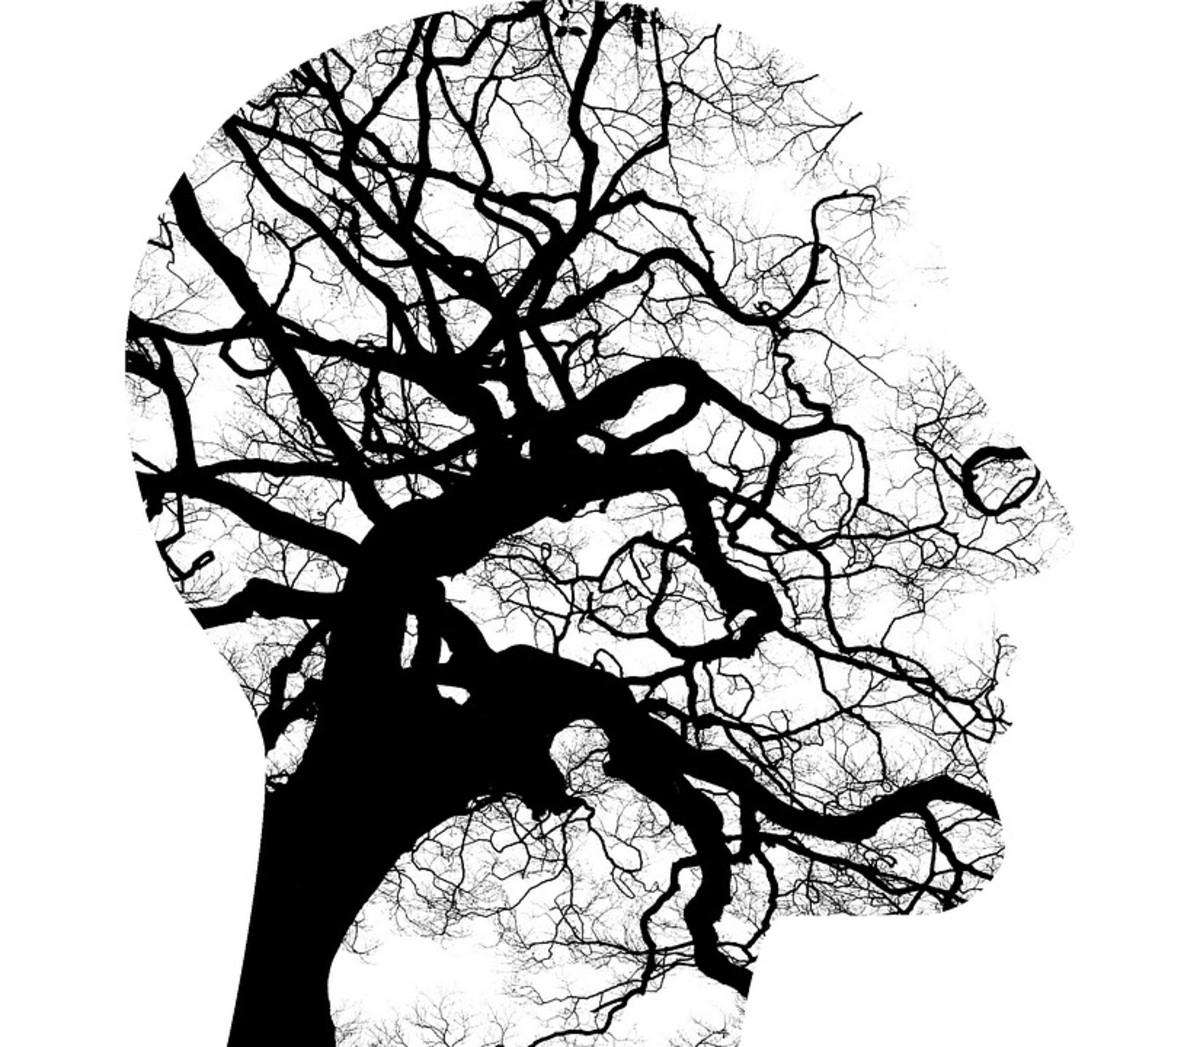 Bipolar Disorder: The Illness of